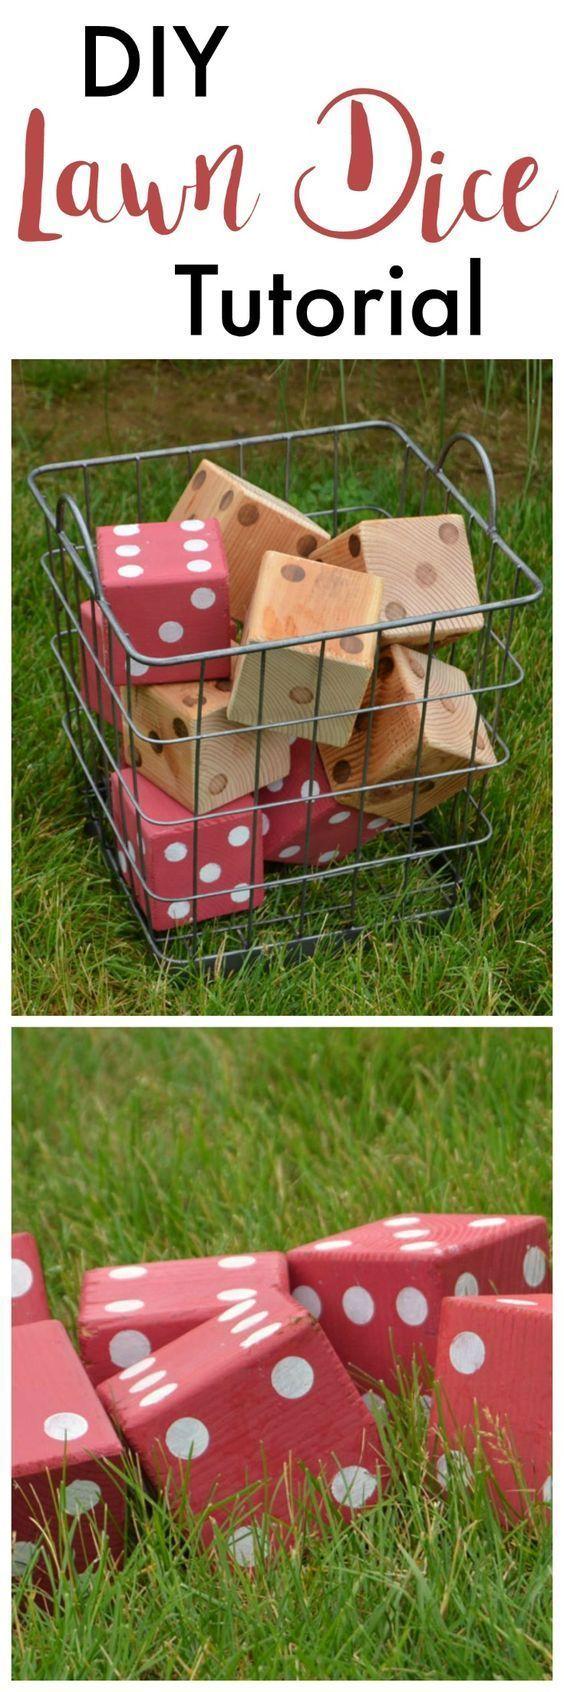 Charming Make Your Own Set Of Lawn Dice, Itu0027s Easy! Backyard GamesLawn GamesOutdoor  ...